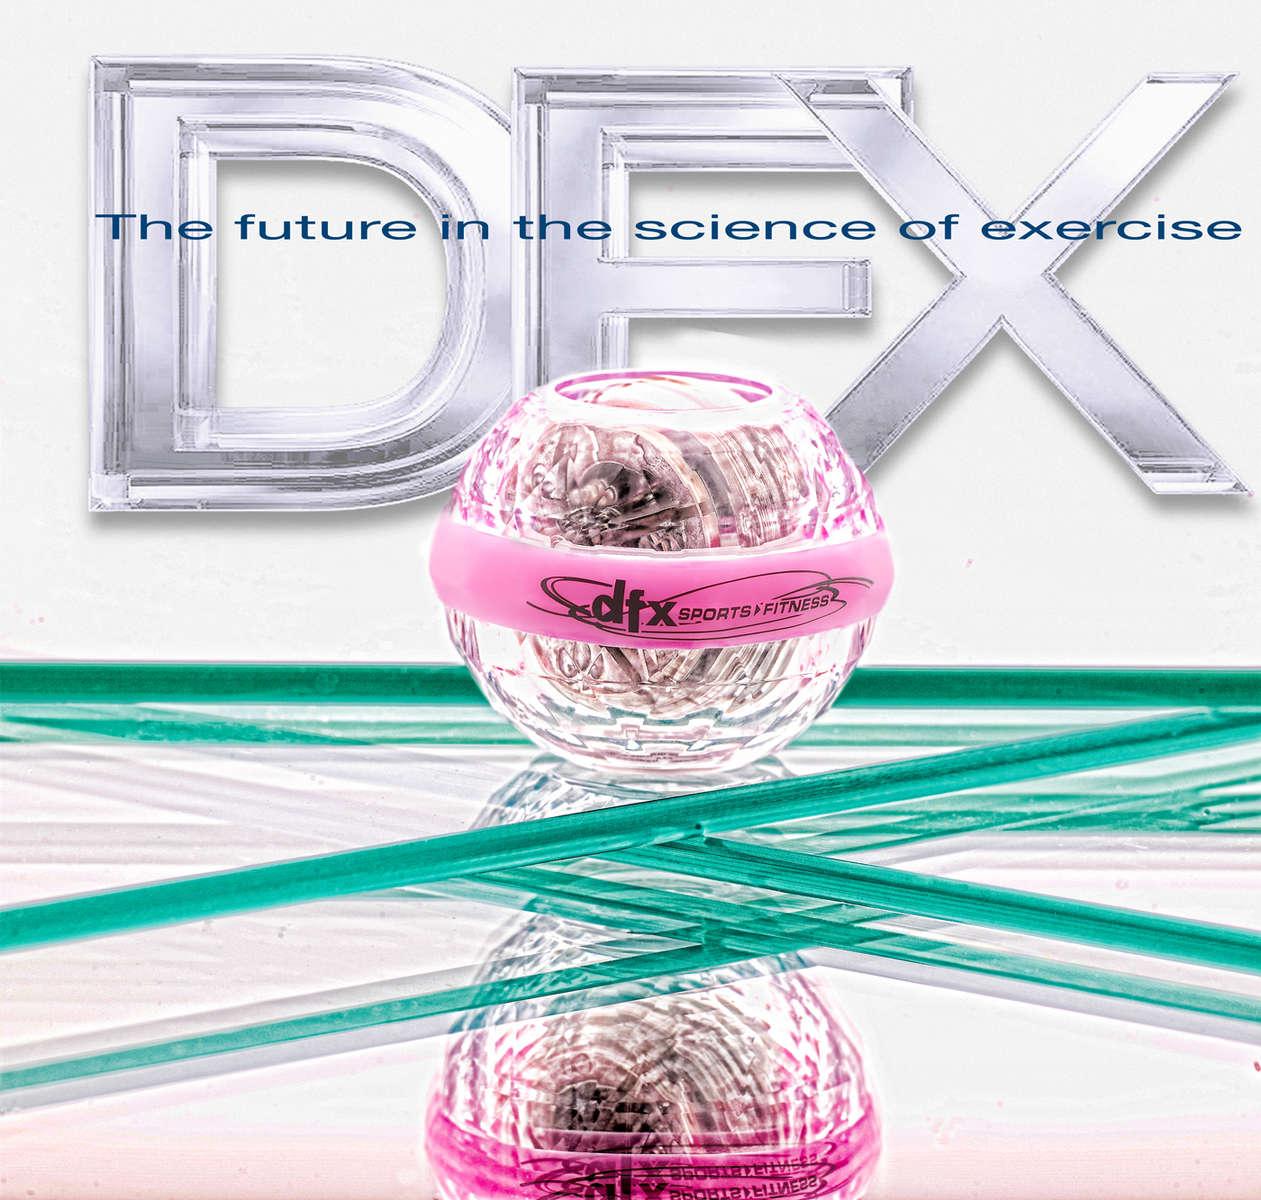 DFX-128829KHP-S1a